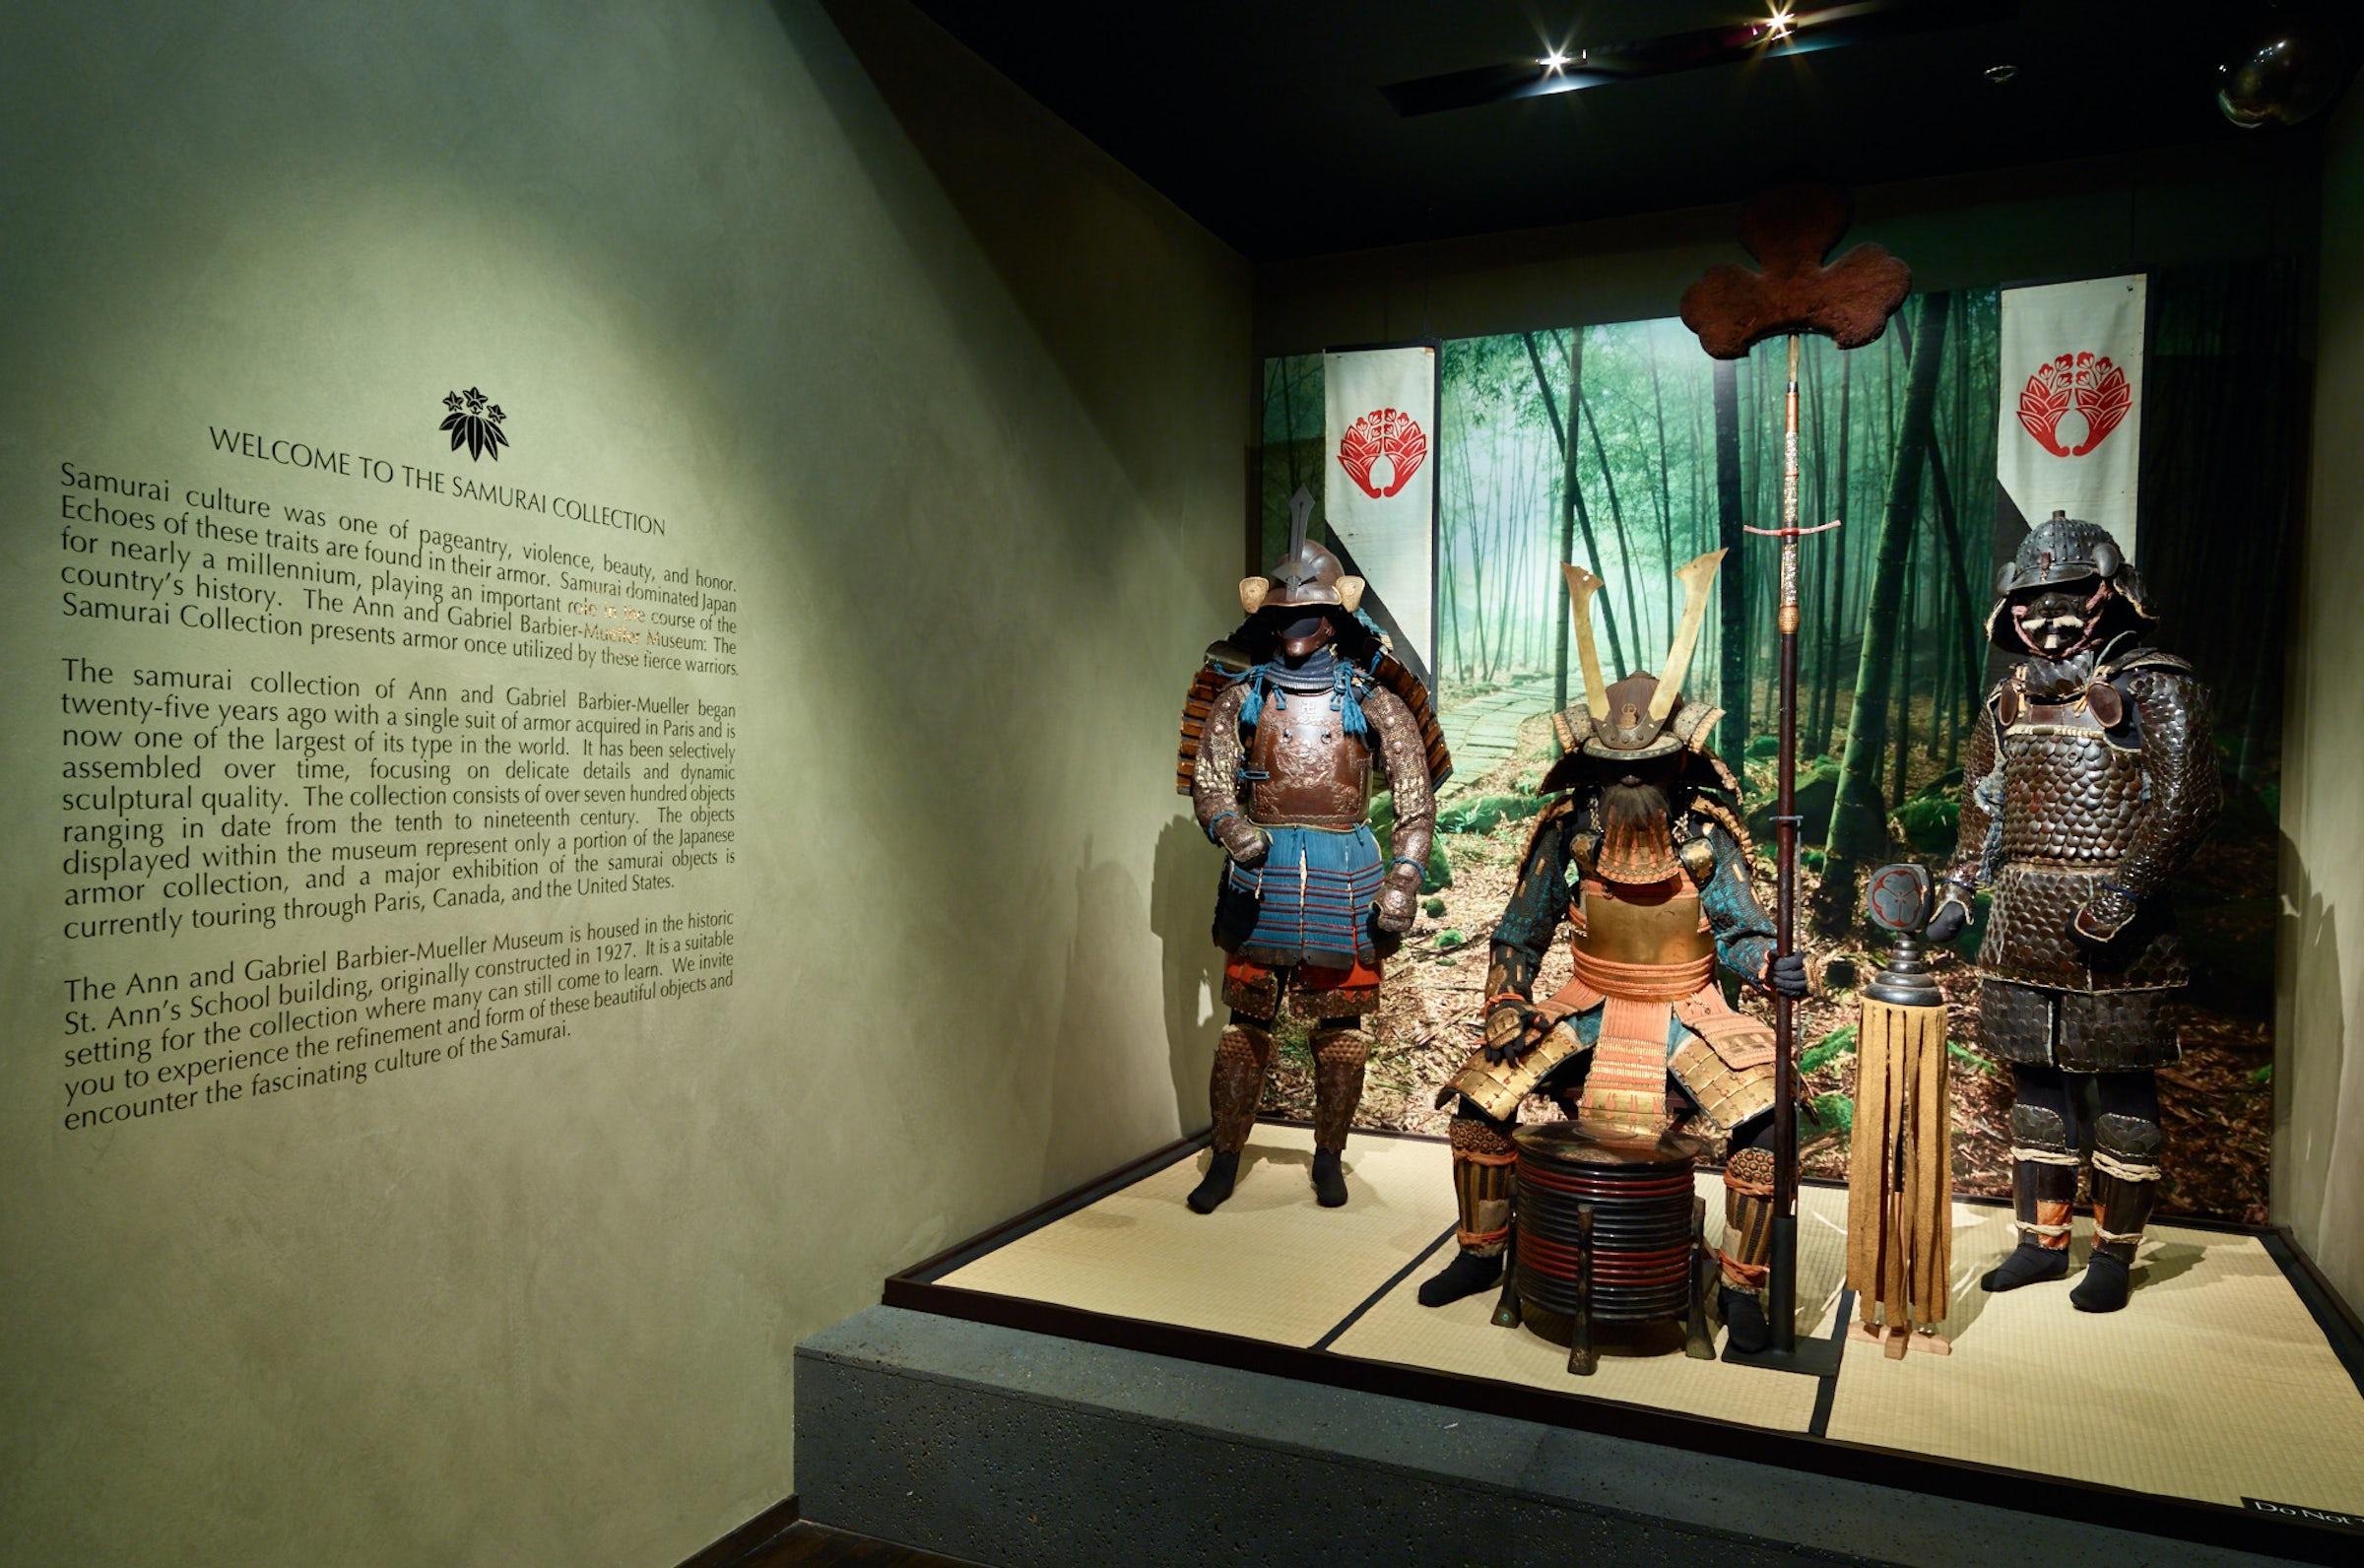 The Ann & Gabriel Barbier-Mueller Museum: The Samurai Collection in Beyond Dallas